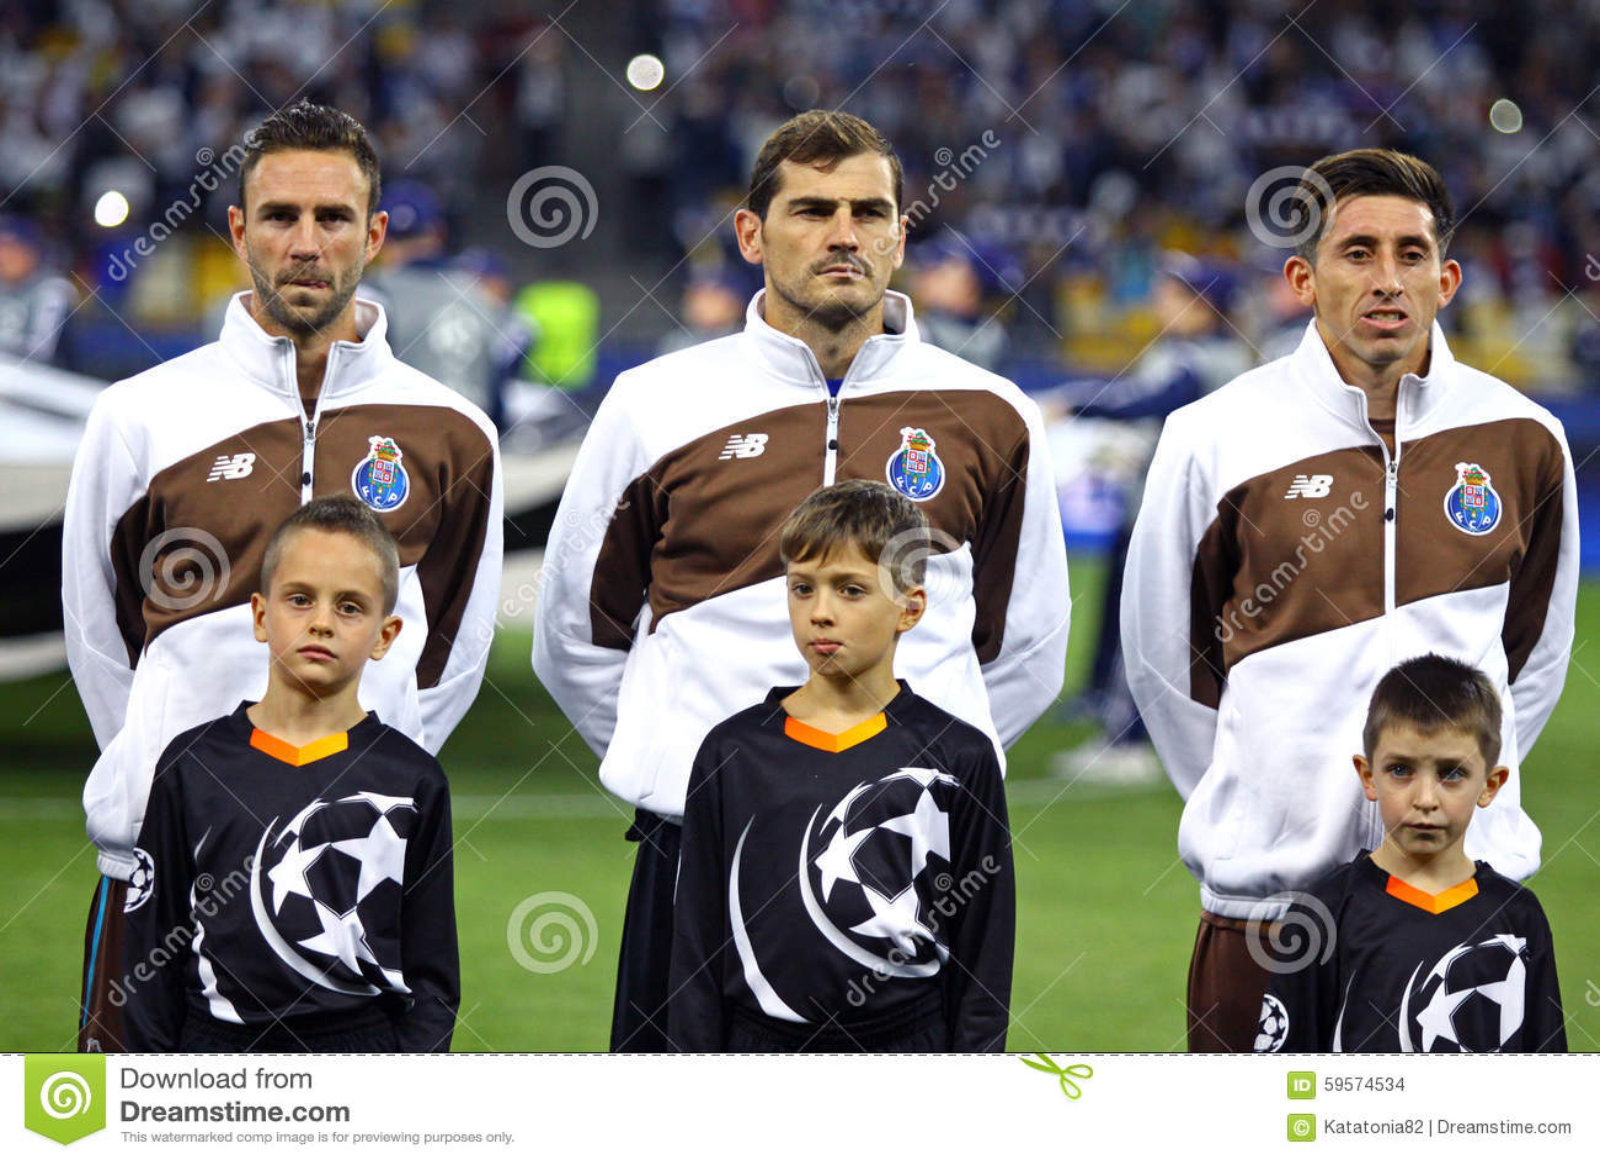 ¿Cuánto mide Héctor Herrera? - Altura Miguel-layun-iker-casillas-hector-herrera-fc-porto-kyiv-ukraine-september-players-listen-official-anthem-uefa-59574534